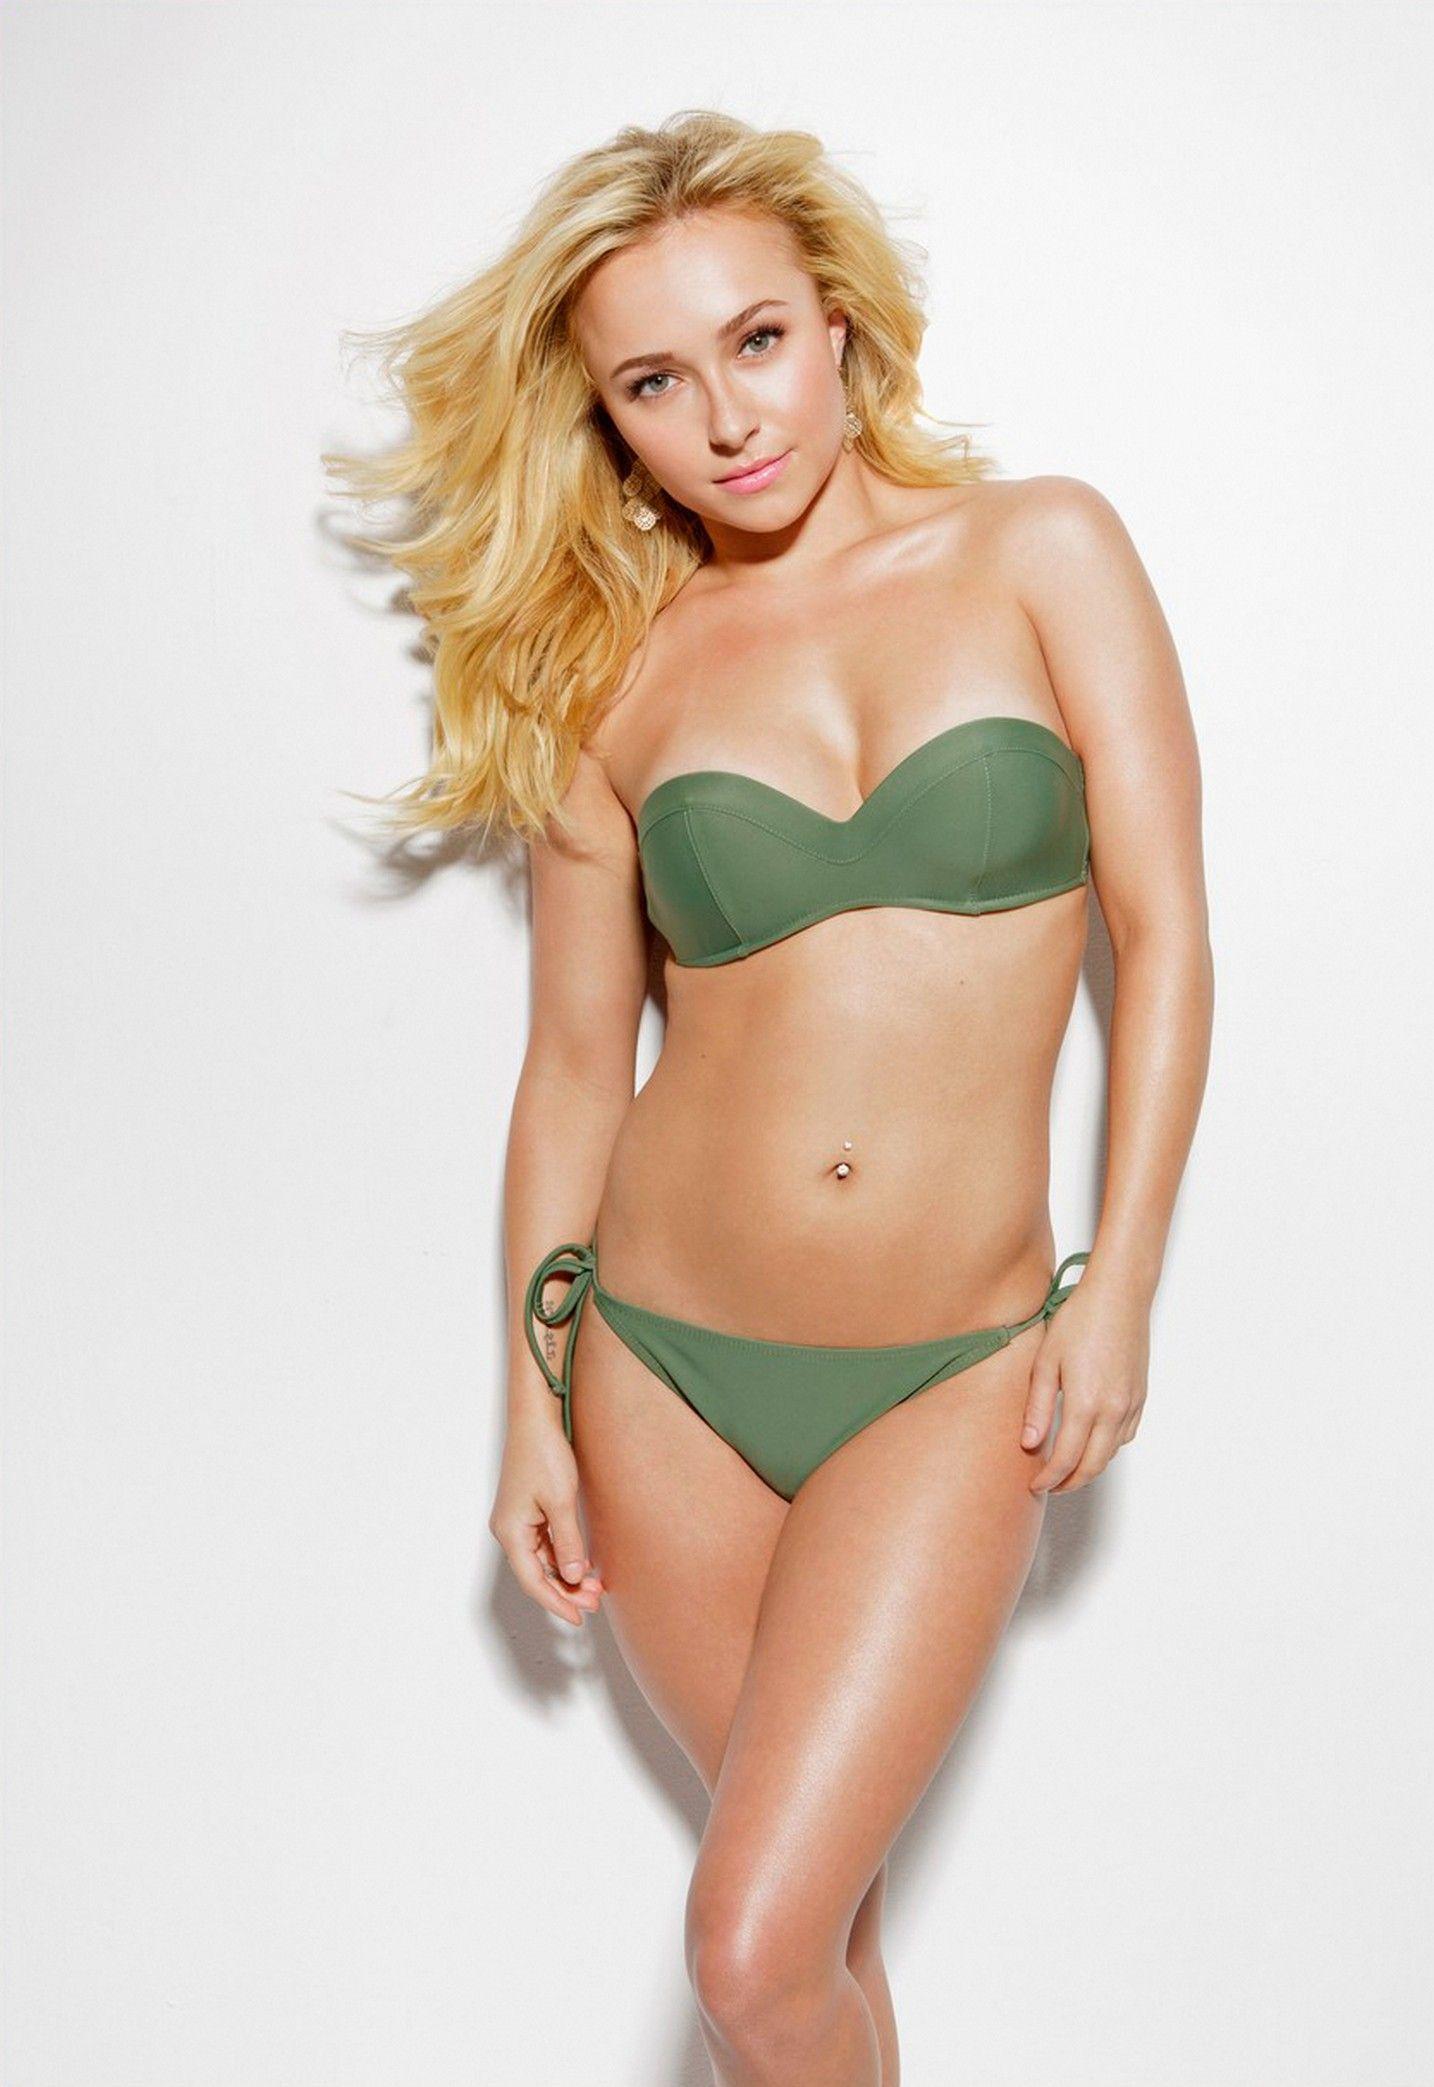 Hayden Panettiere Strips Down To Her Bikini